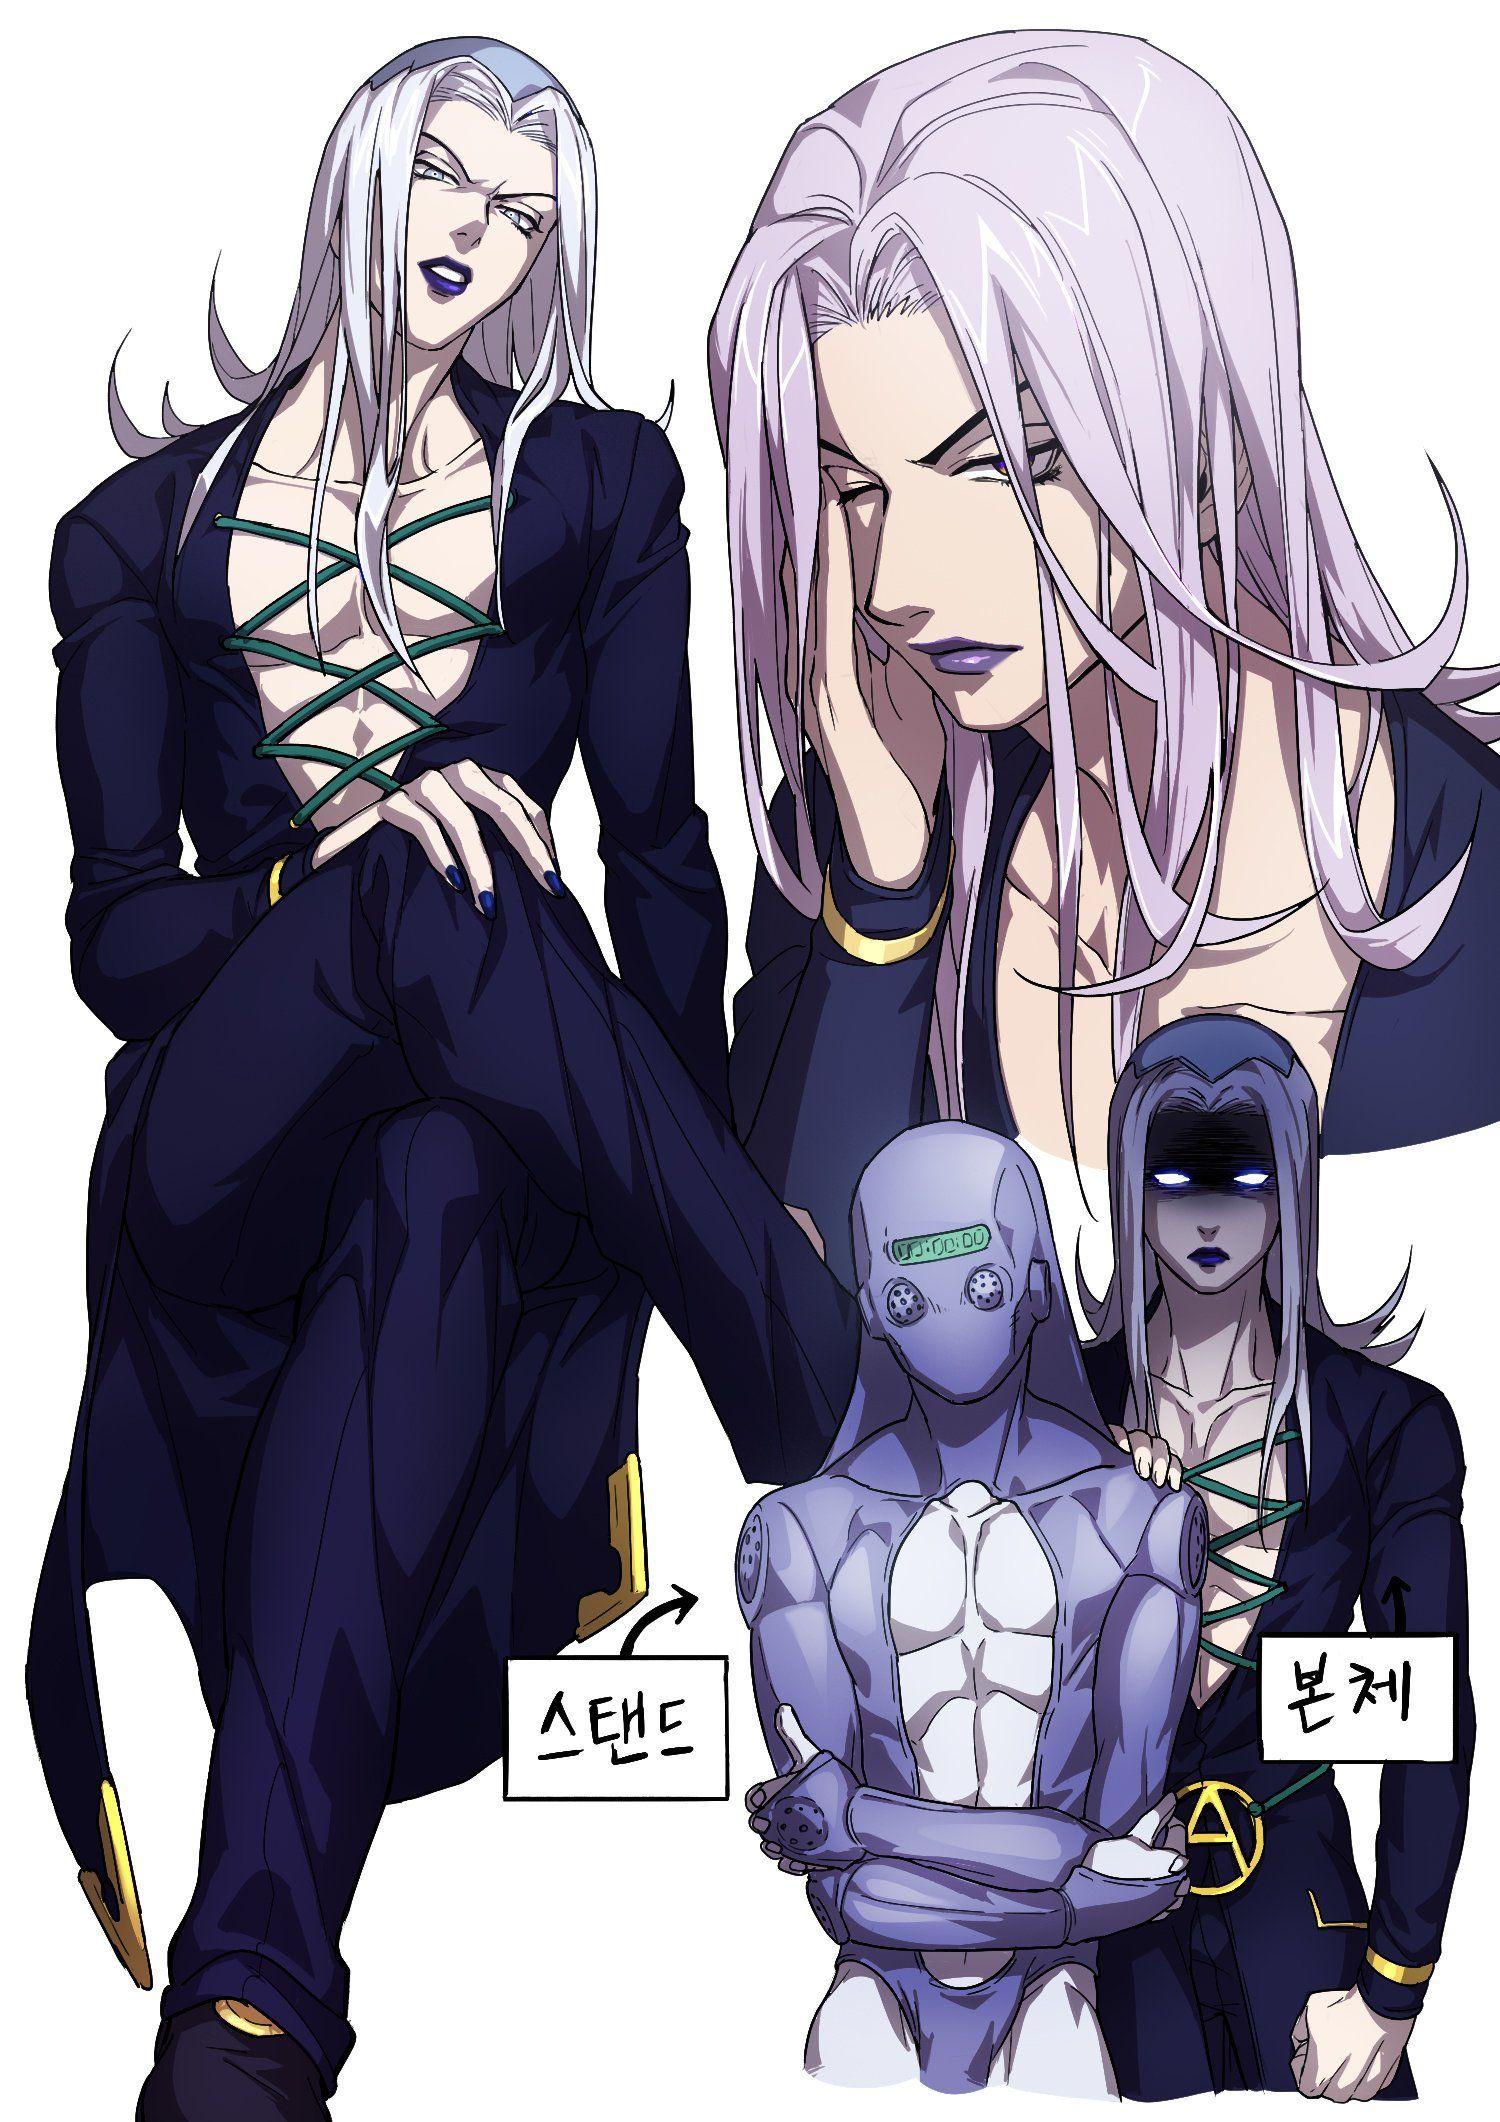 Pin on anime/manga